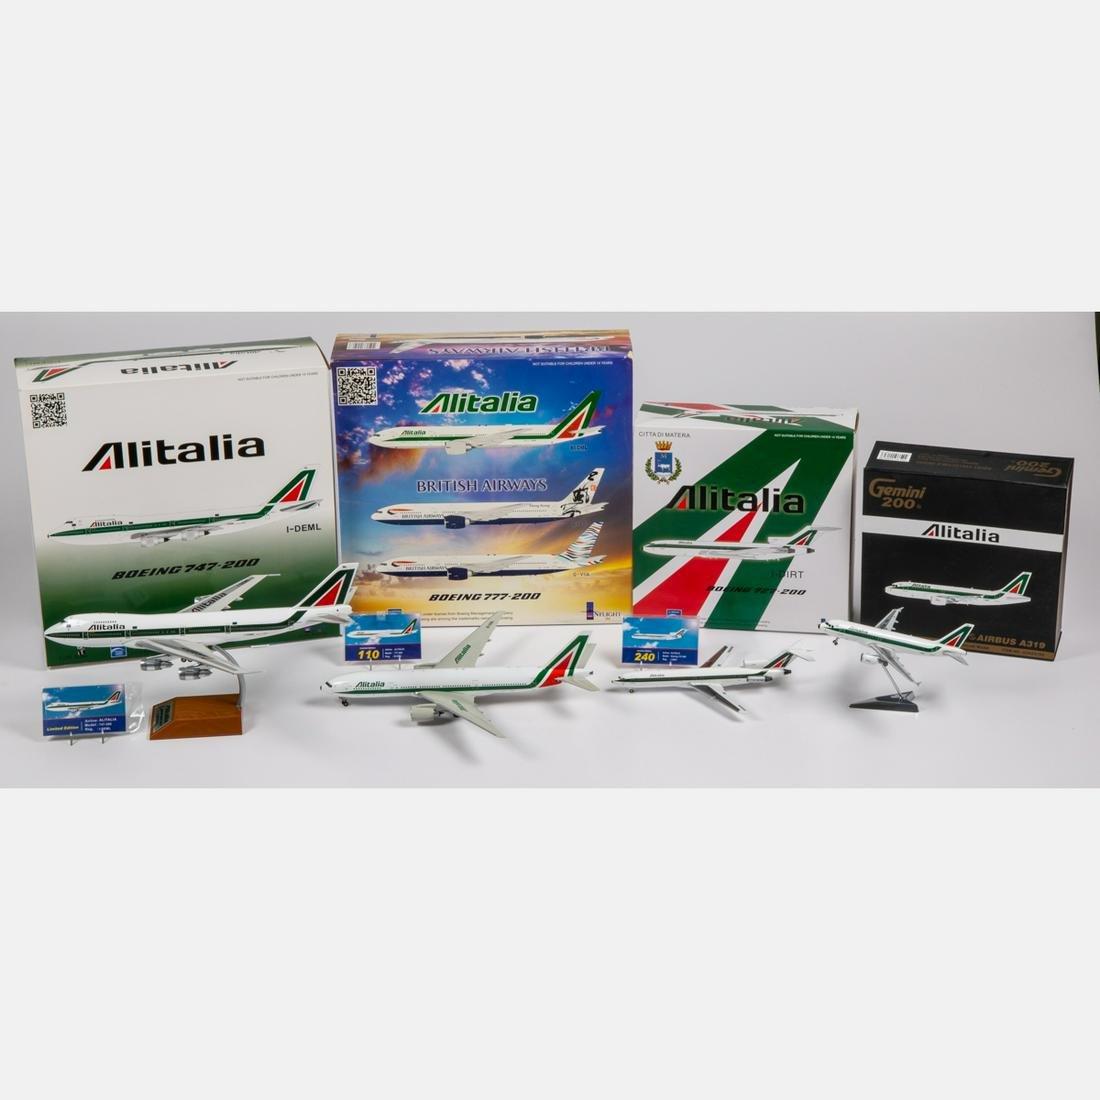 Four Alitalia Diecast Airplanes